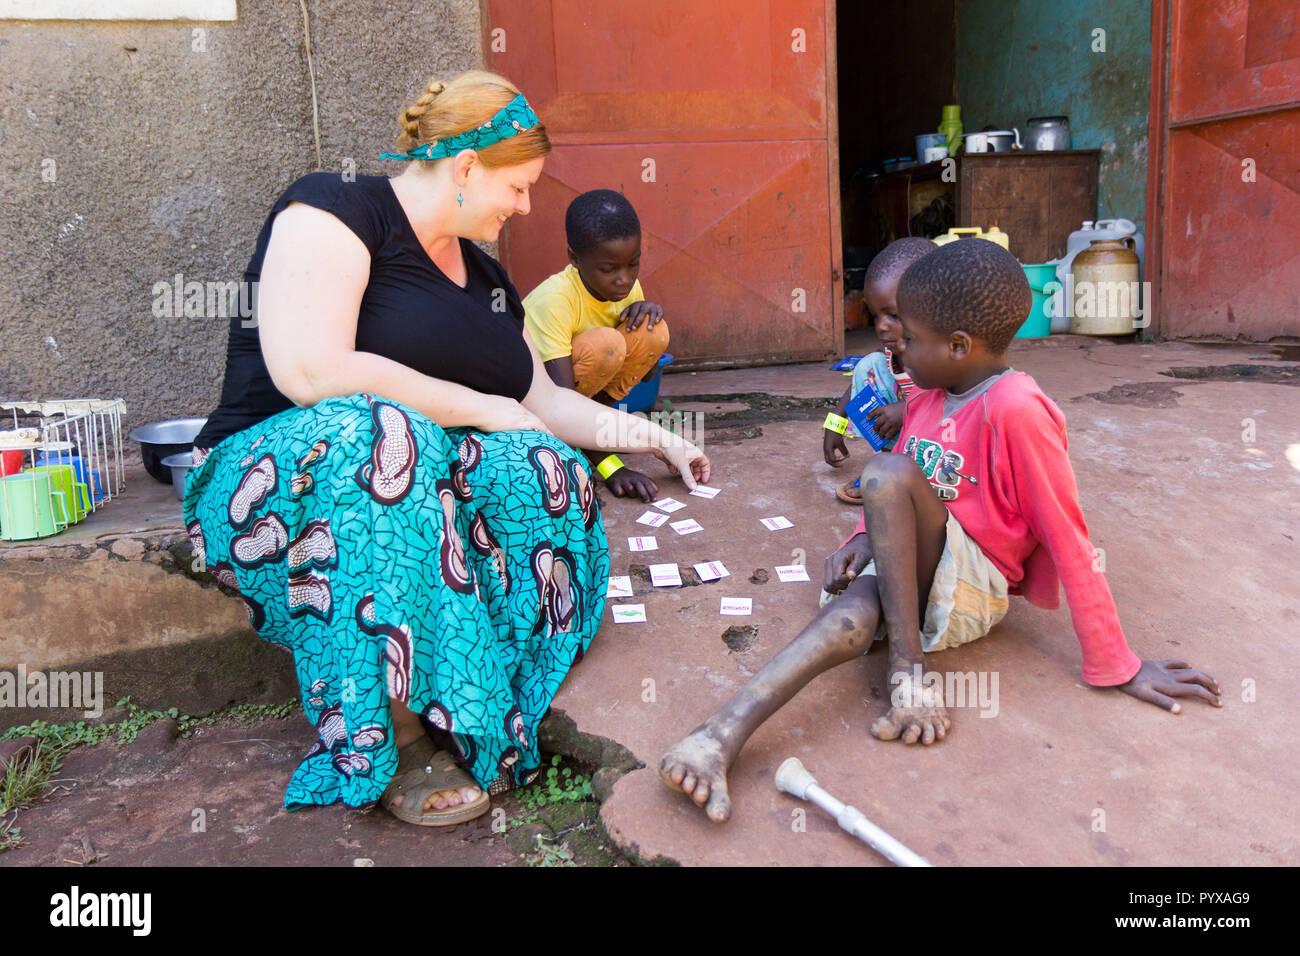 afrikansk dating mzungu